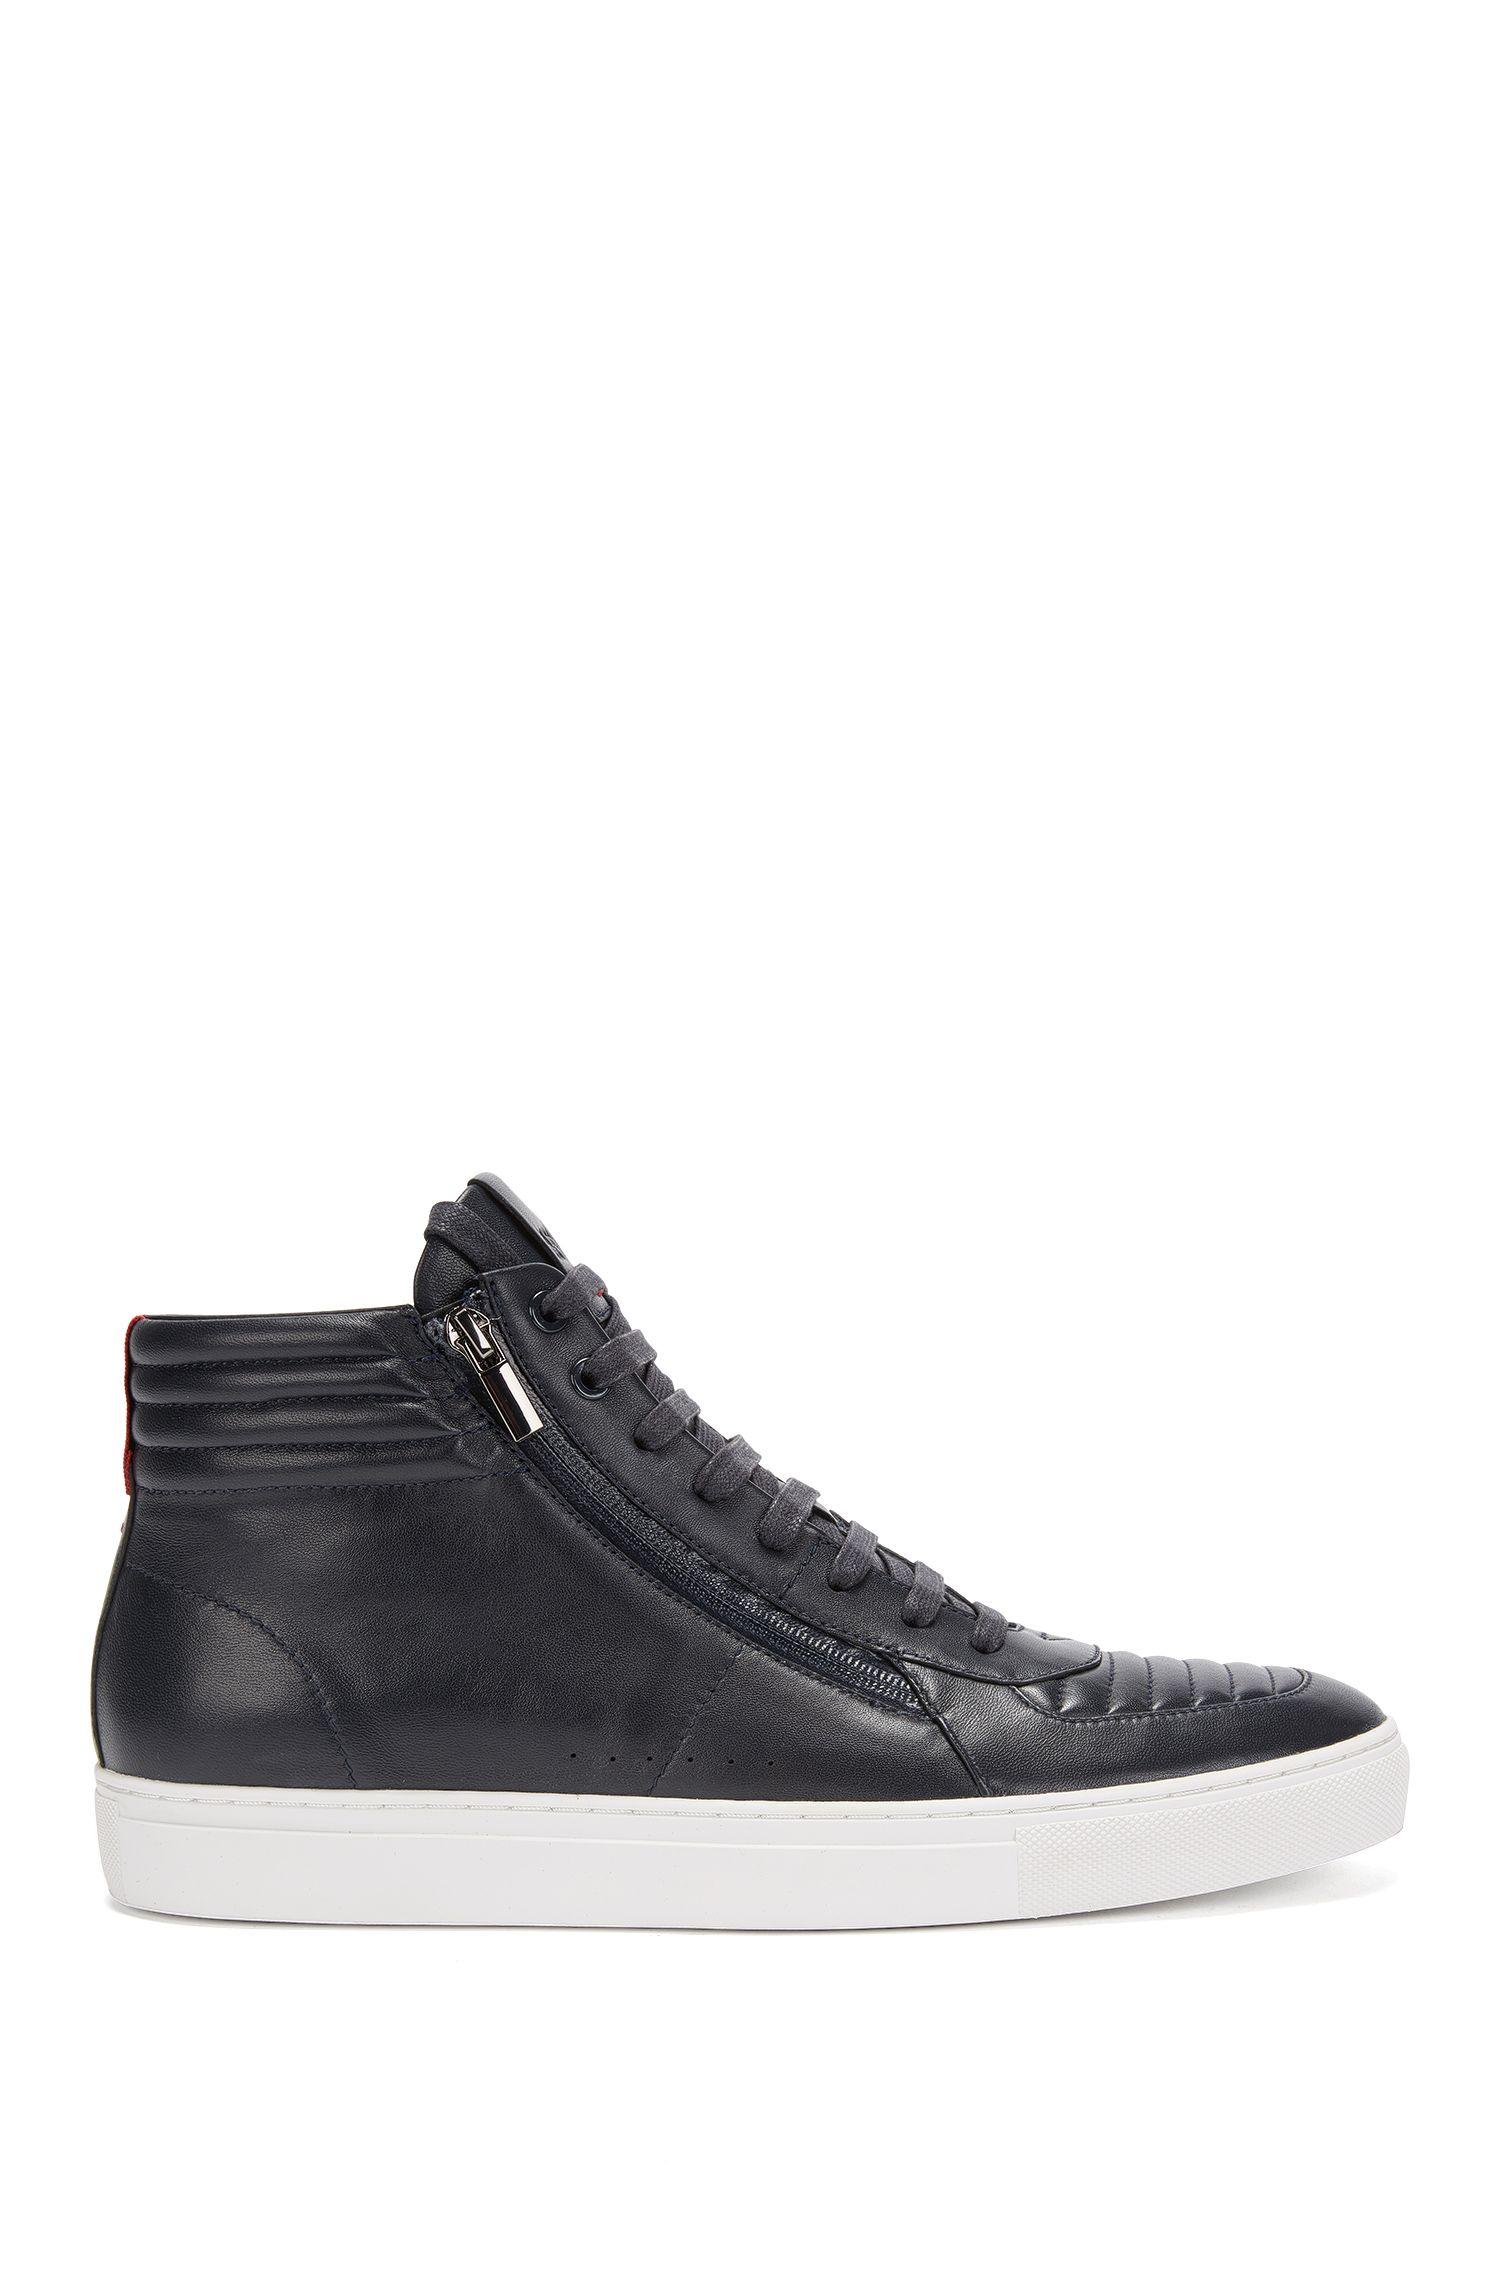 Sneakers stringate high-top in pelle nappa imbottita